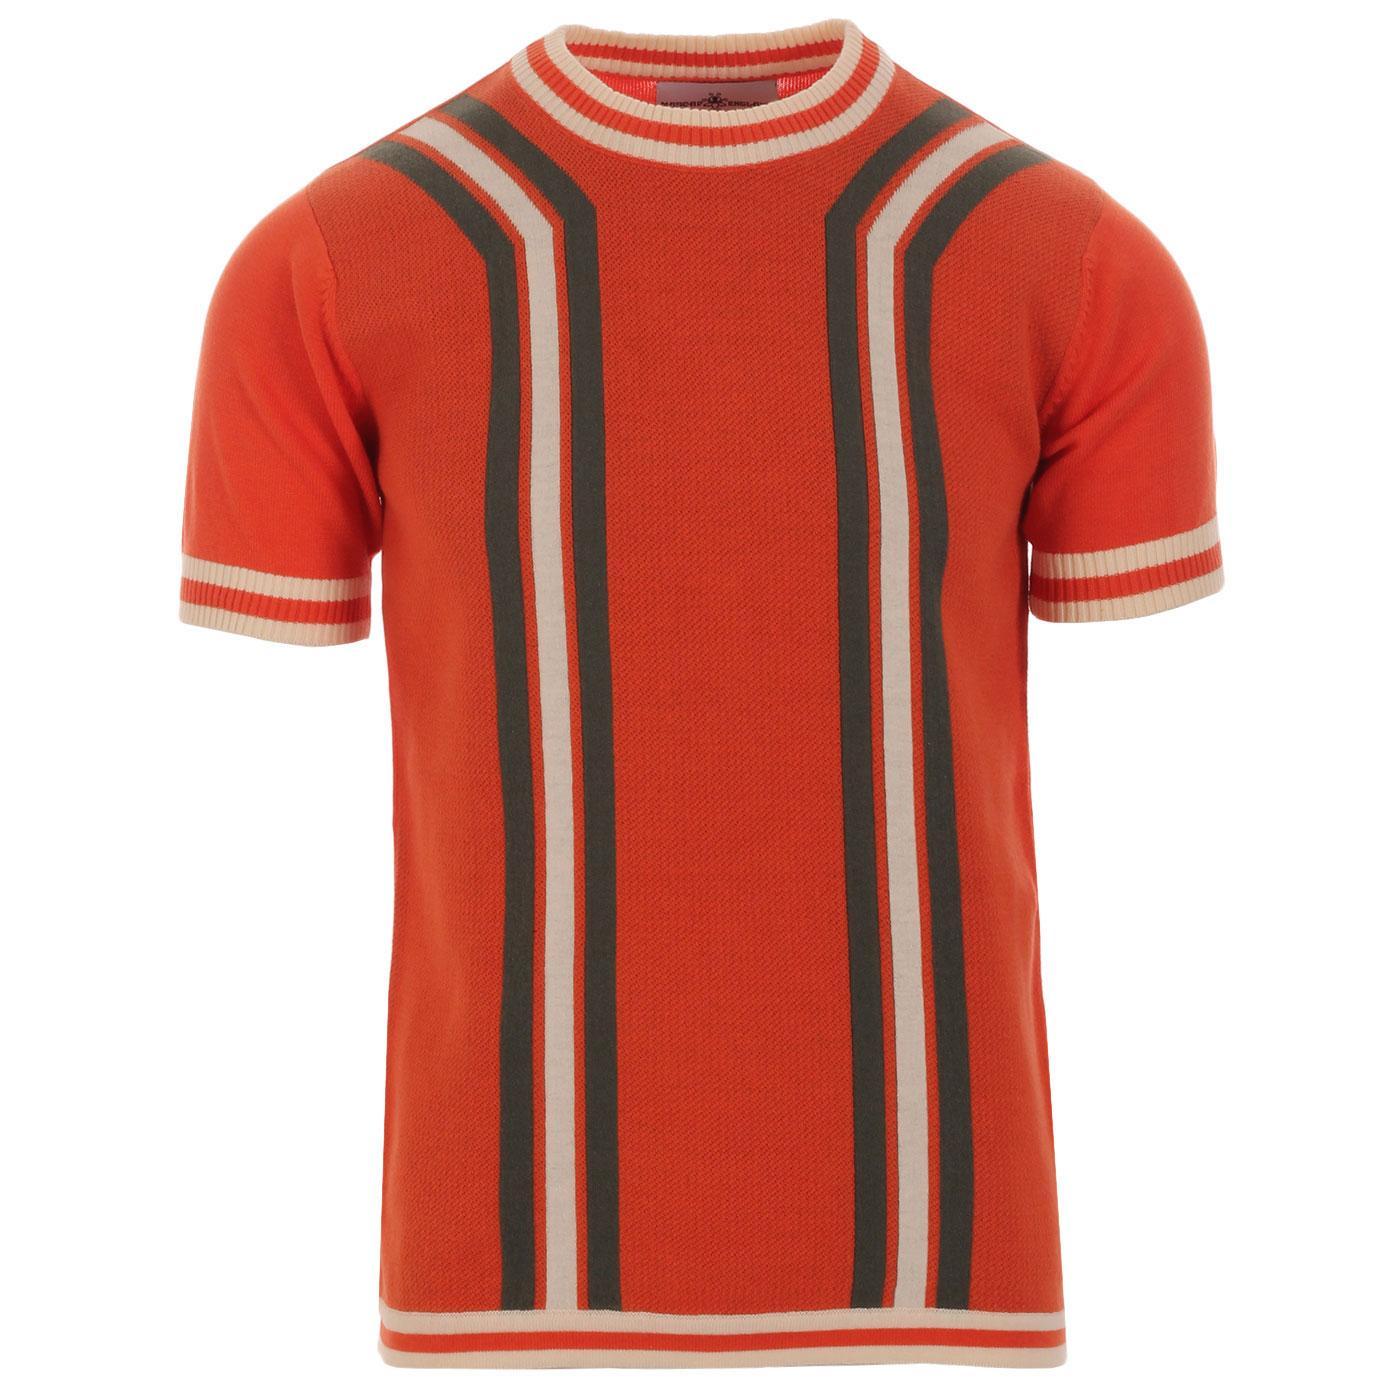 Madcap England Modernista Retro Mod Knitted Contoured Stripe Tee in Koi